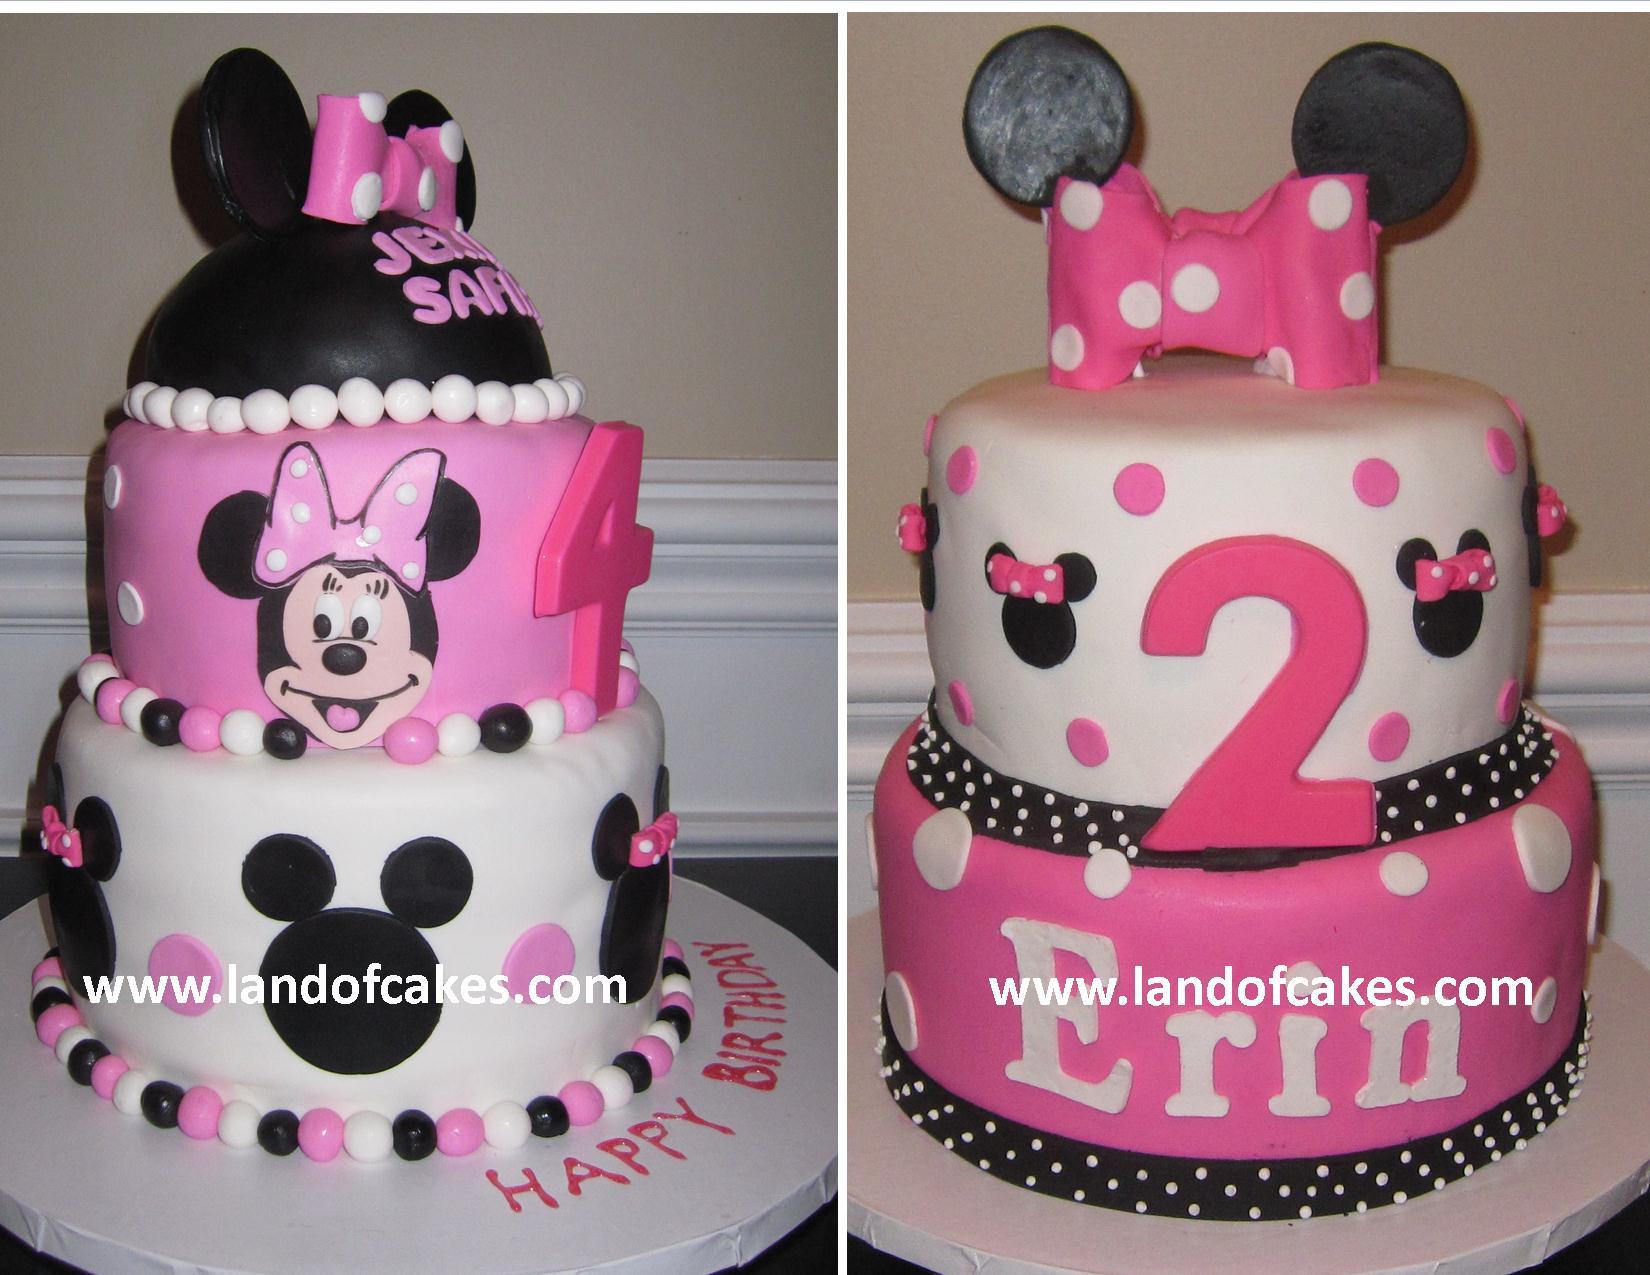 Birthday Cake Ideas Minnie Mouse : Cake Gallery: cakes   Birthday Parties   Minnie Mouse cakes